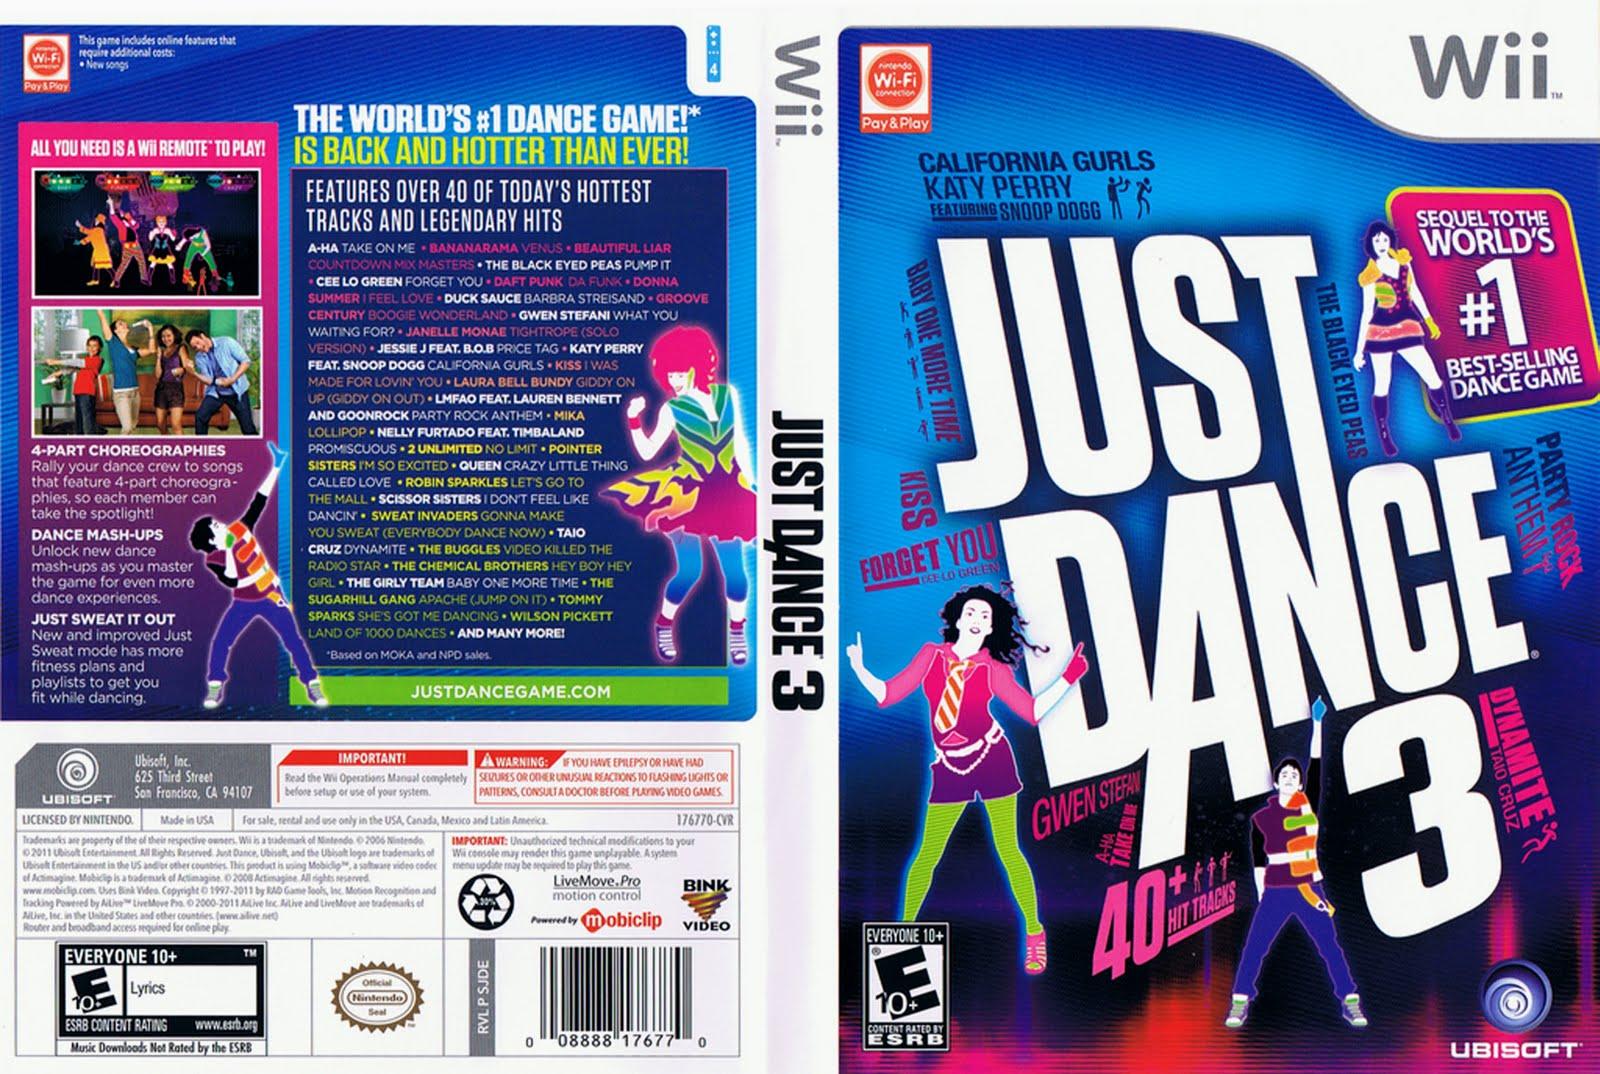 games covers just dance 3 wii. Black Bedroom Furniture Sets. Home Design Ideas